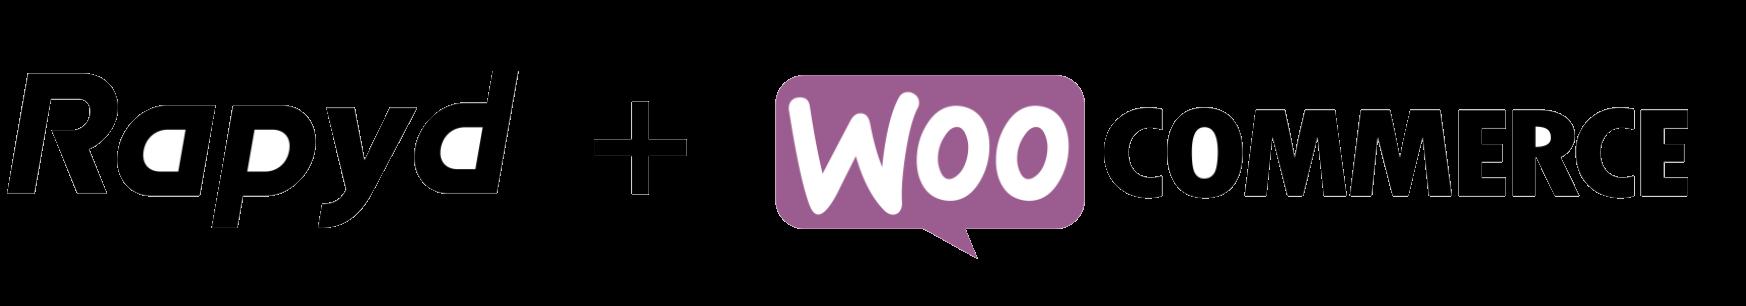 Rapyd + WooCommerce logos-2